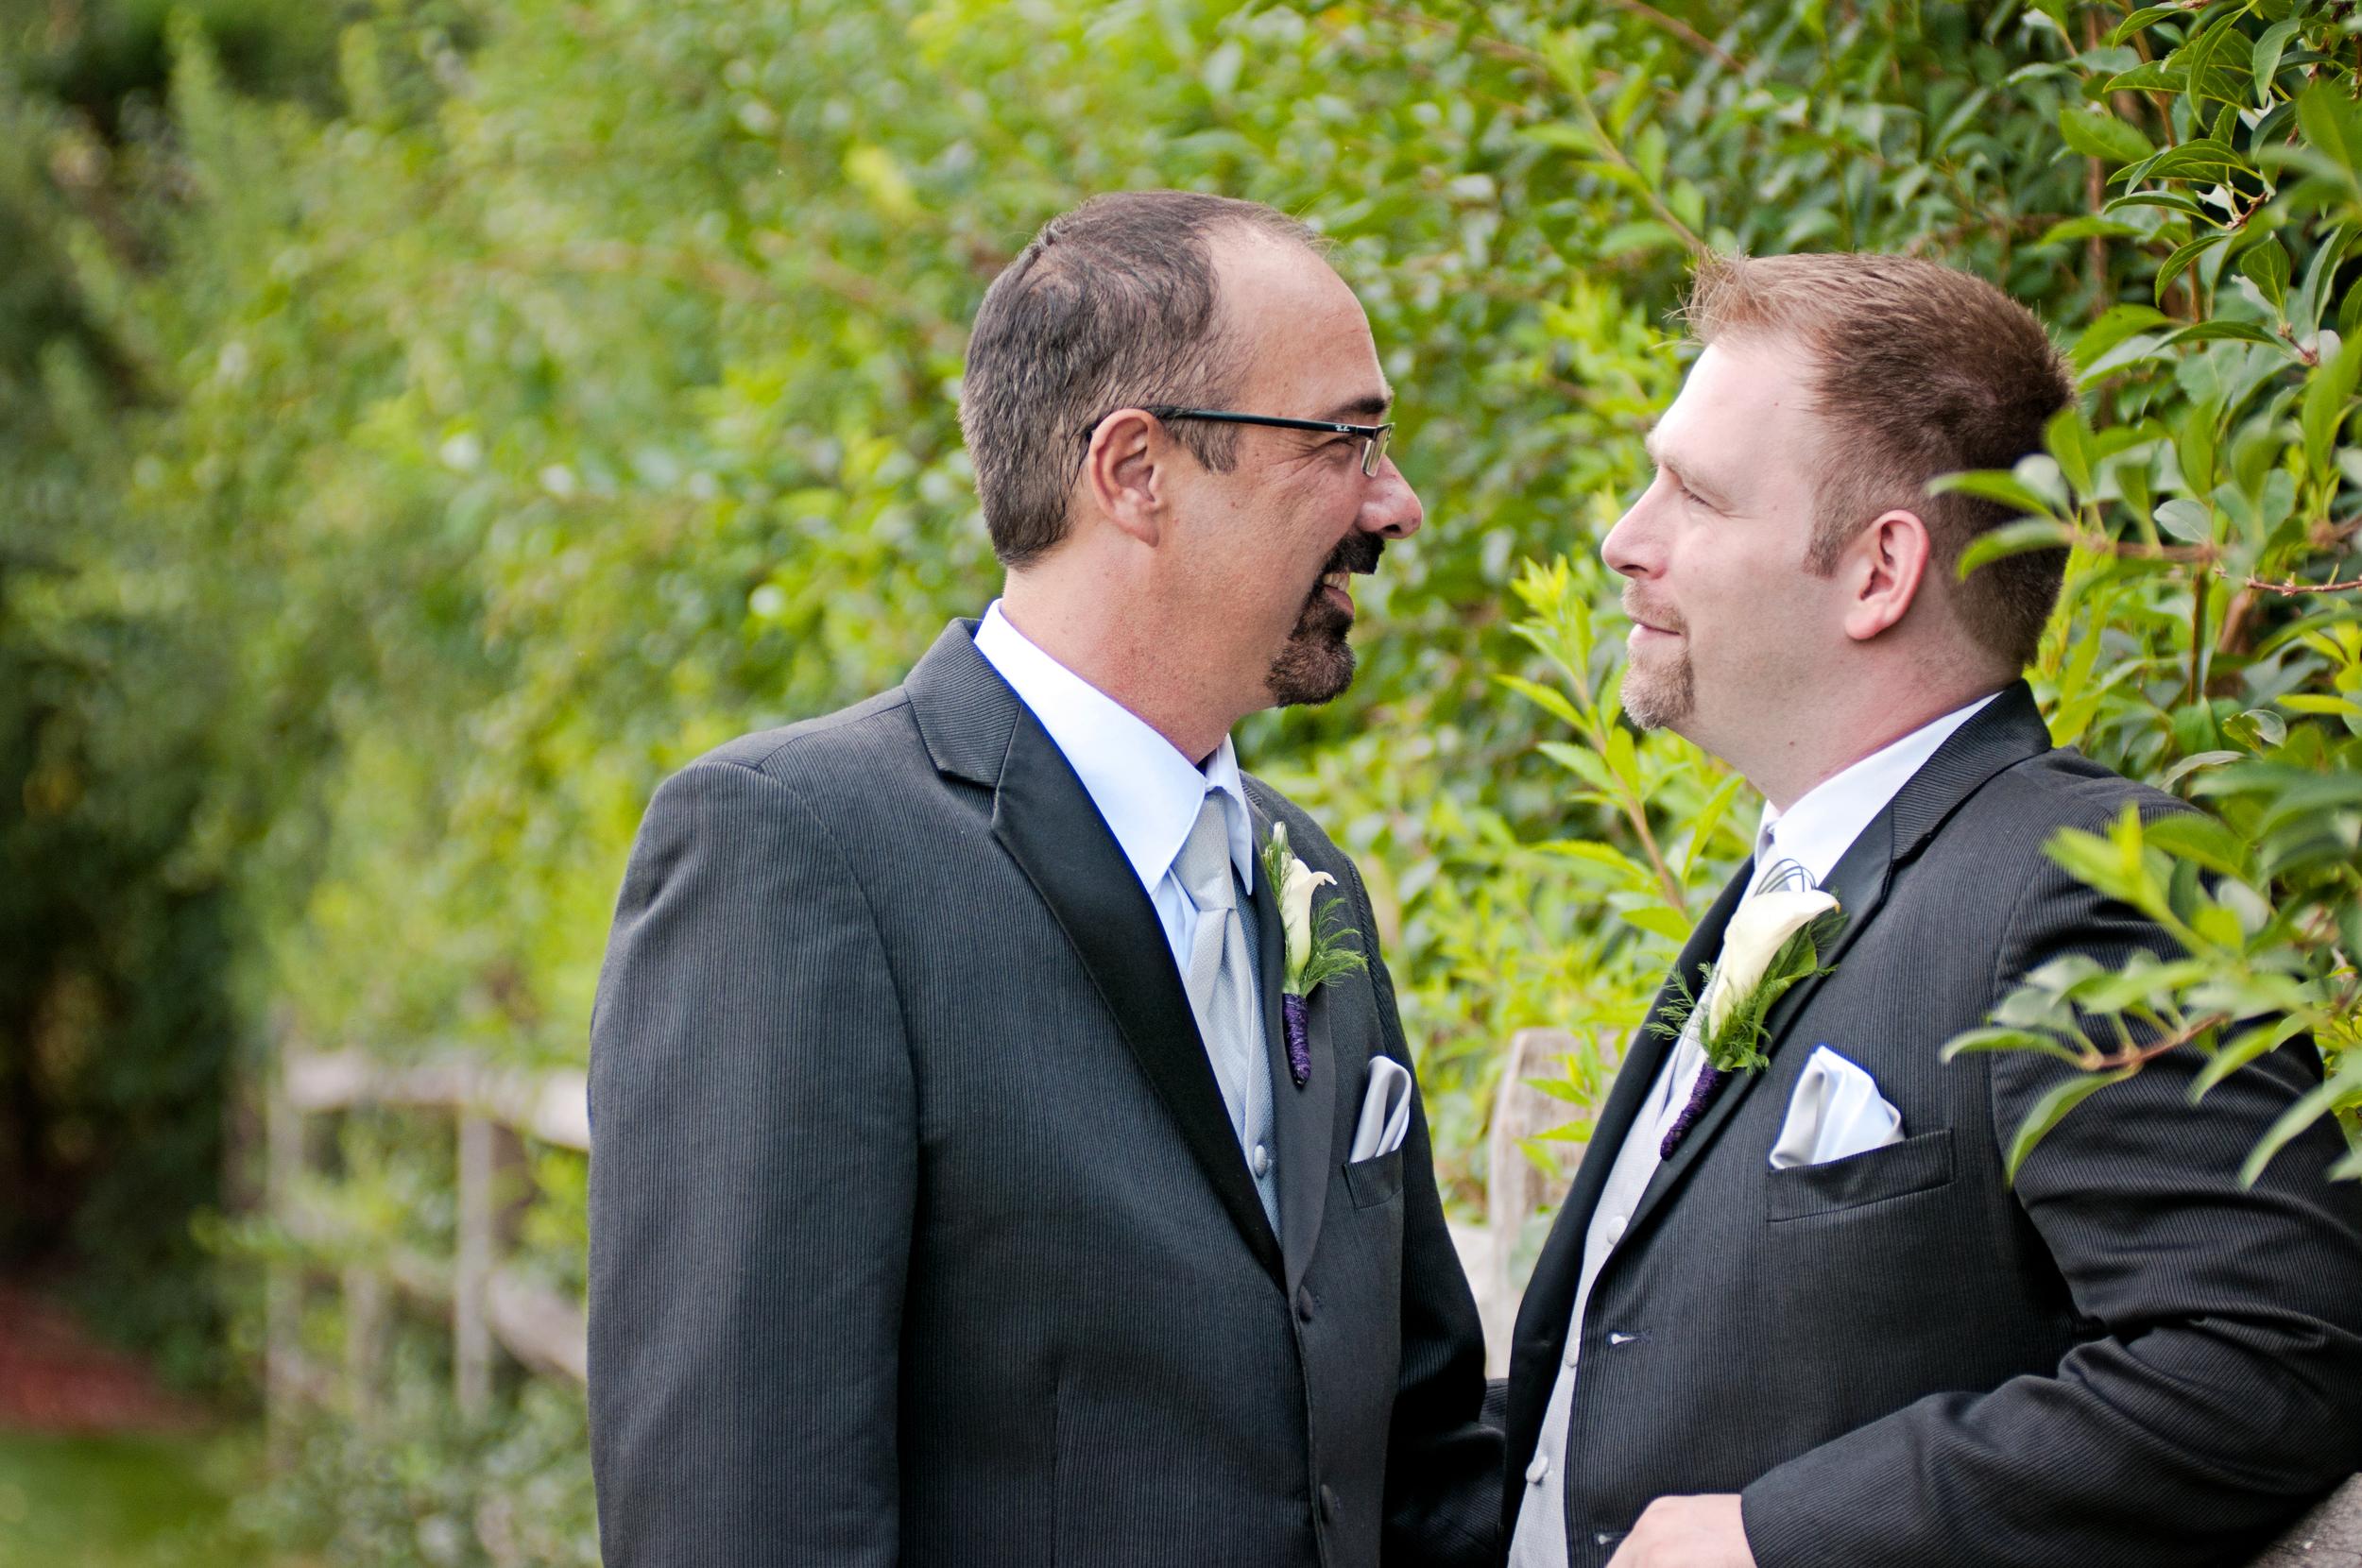 Angela_Chicoski_CT_wedding_photographer_100.jpg